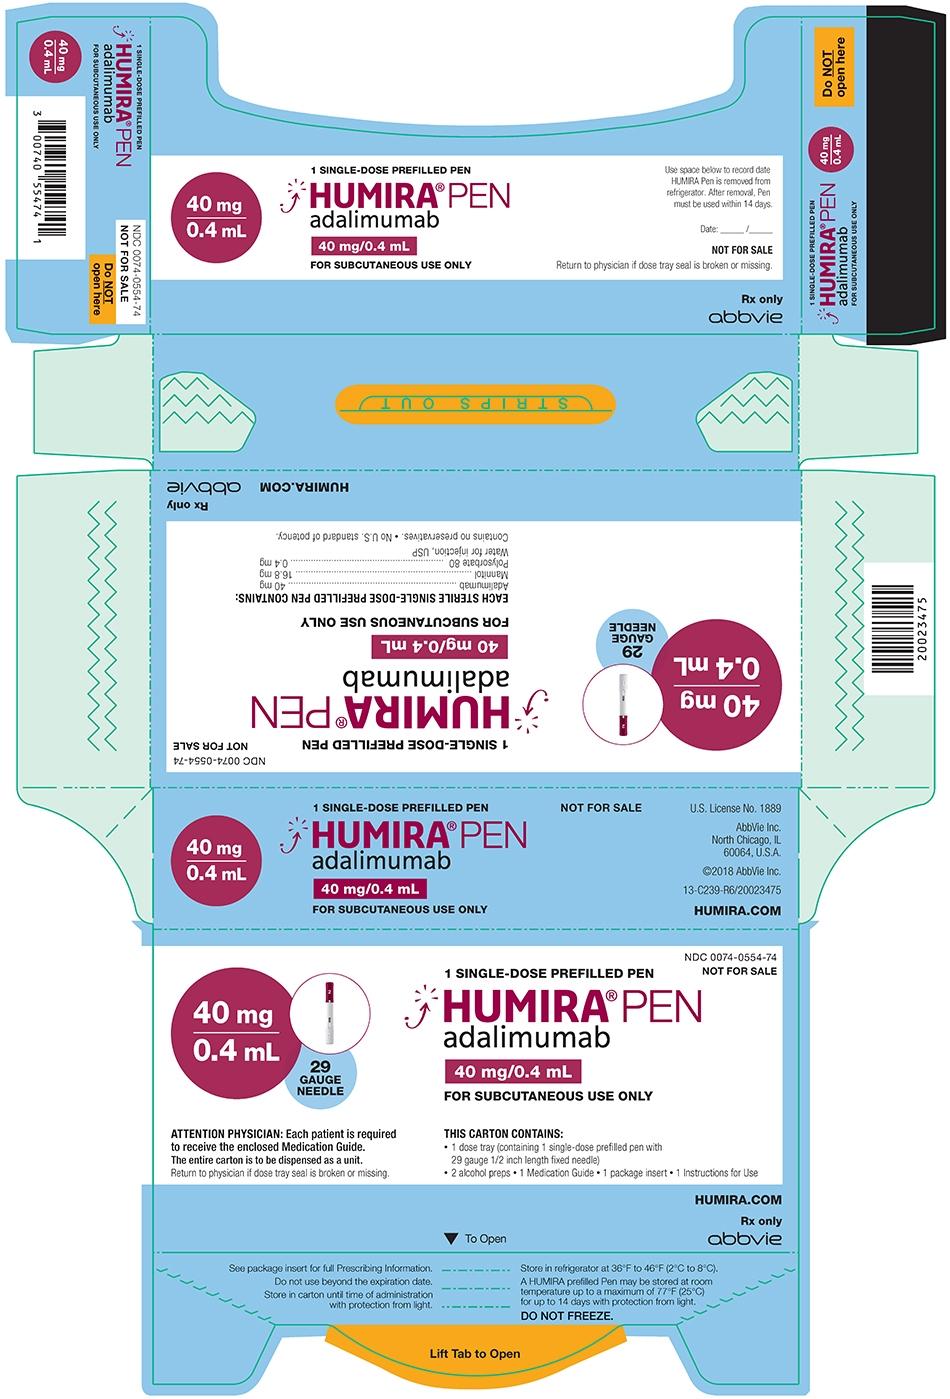 carton-humira-pen-mai-40mg04ml-1ct-sample